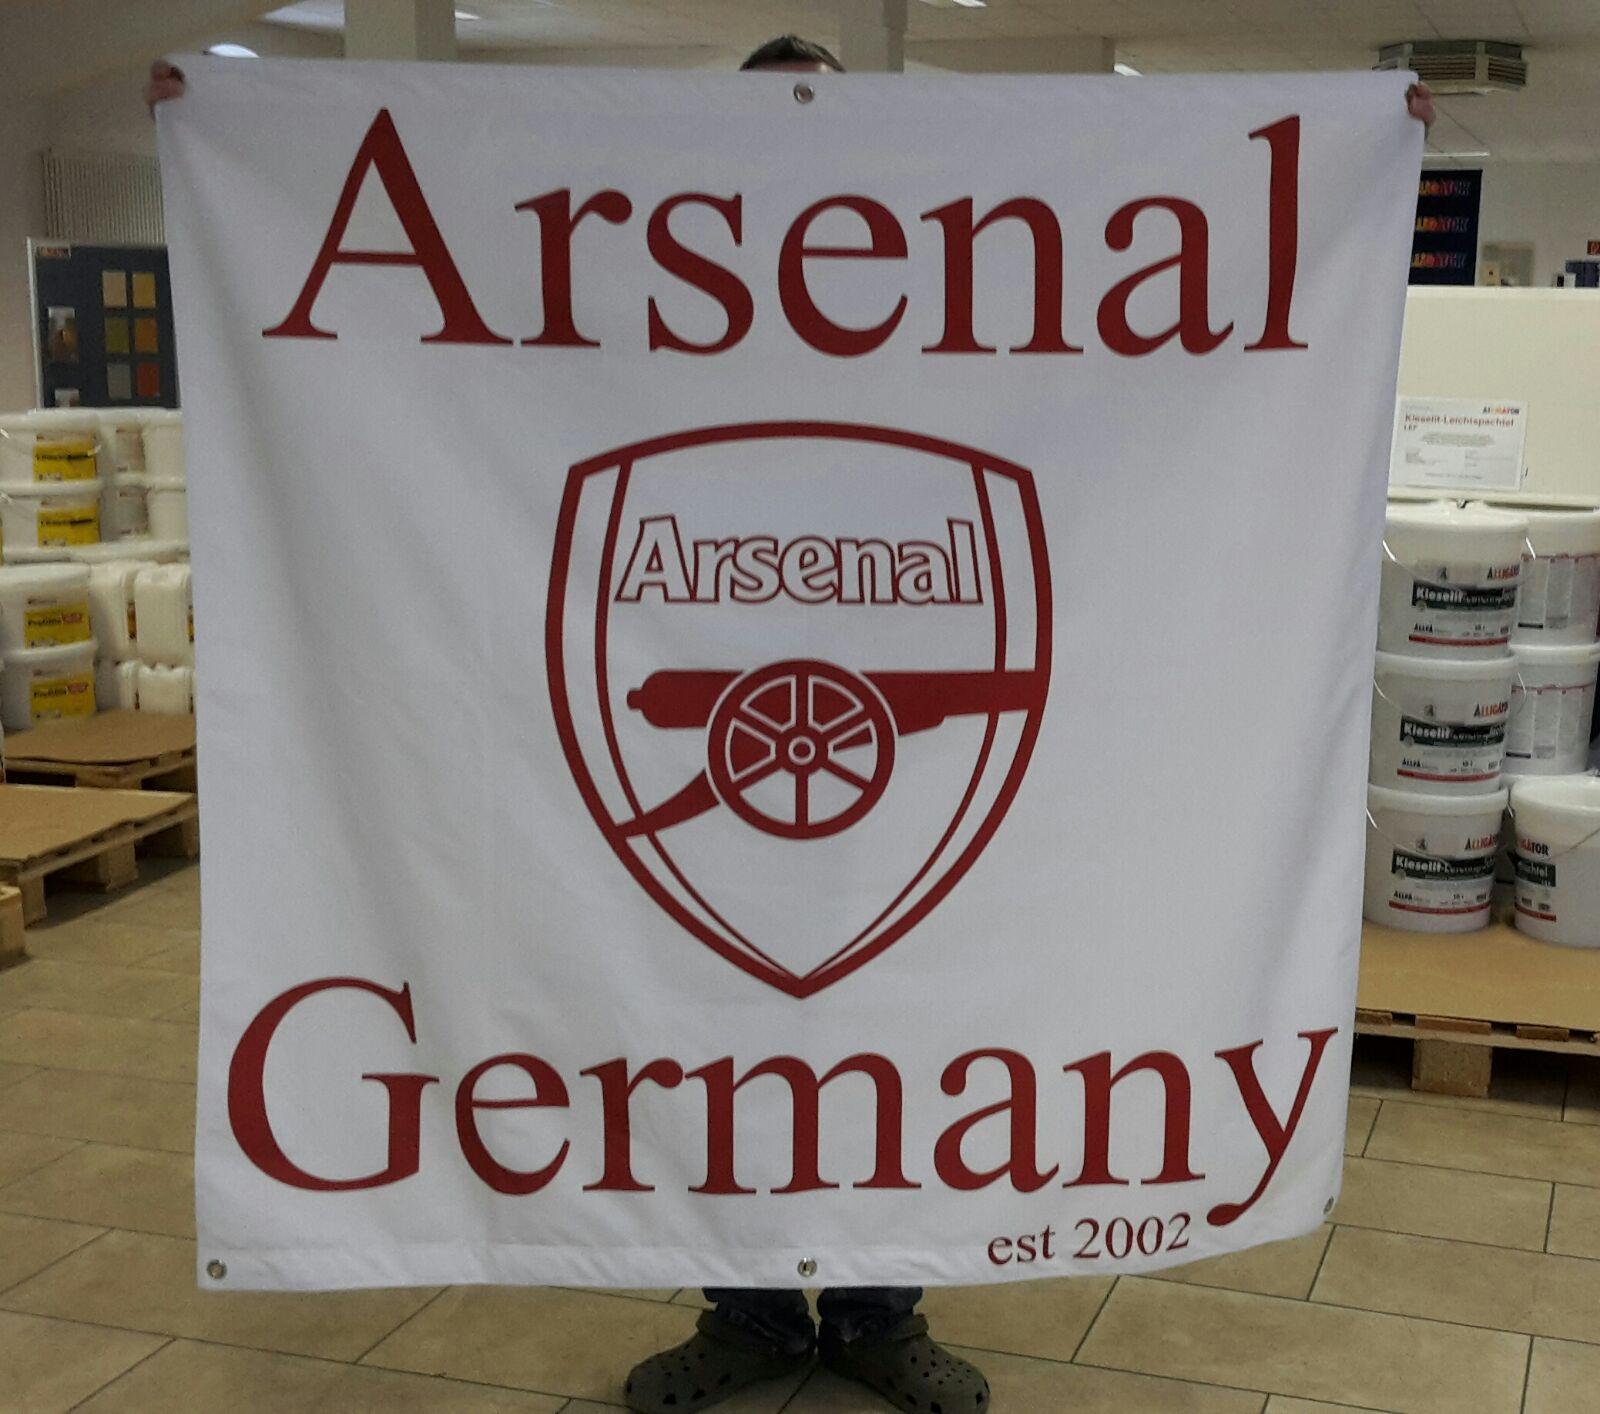 Arsenal Germany est. 2002 Flag